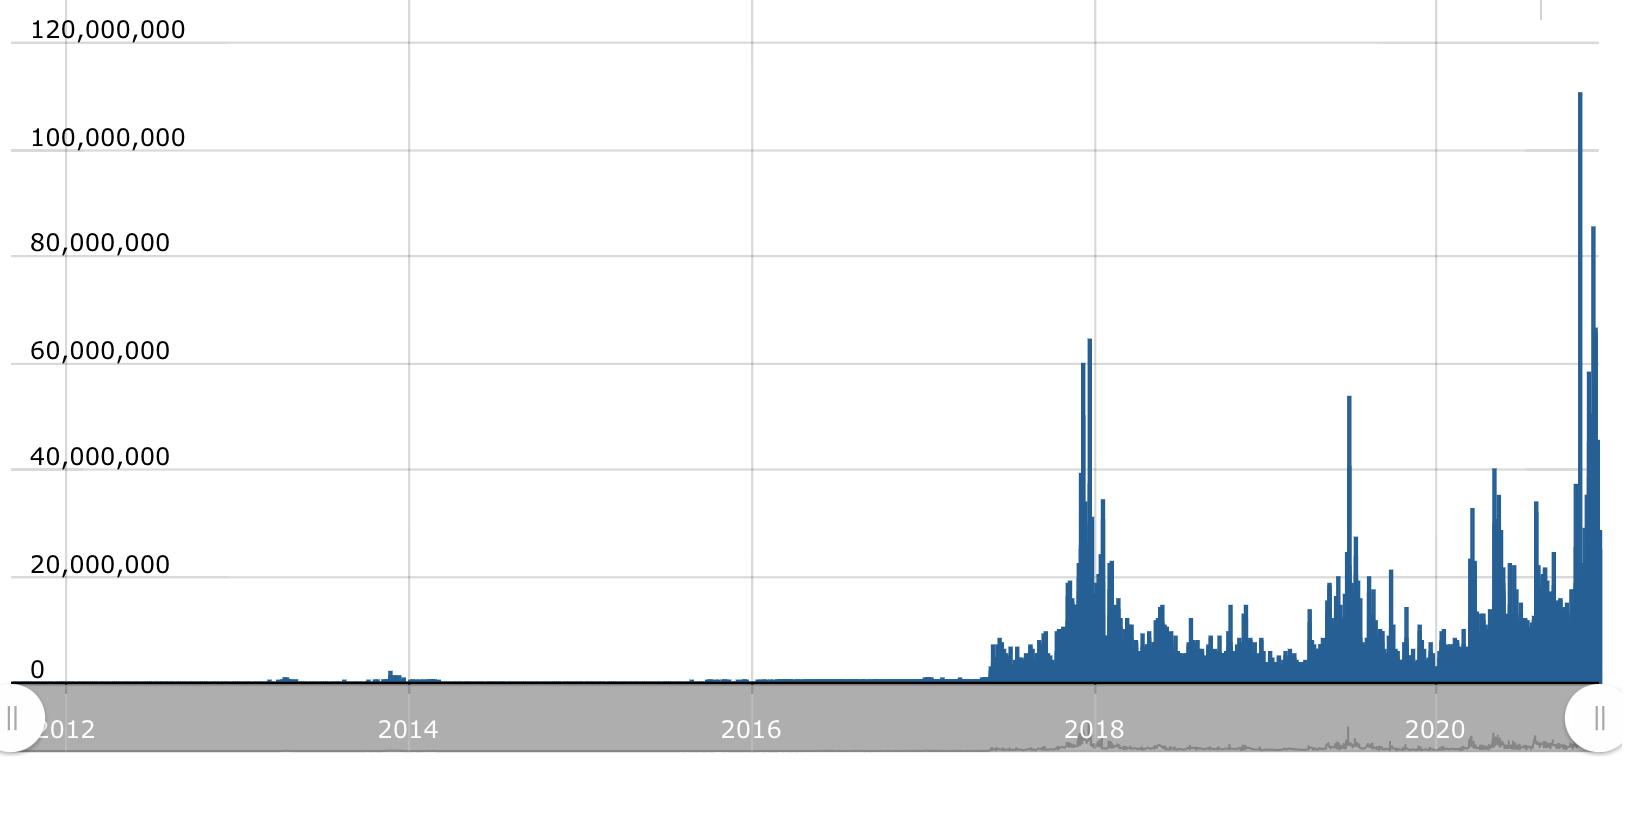 Bitcoin volumes in GBP, Dec 2020